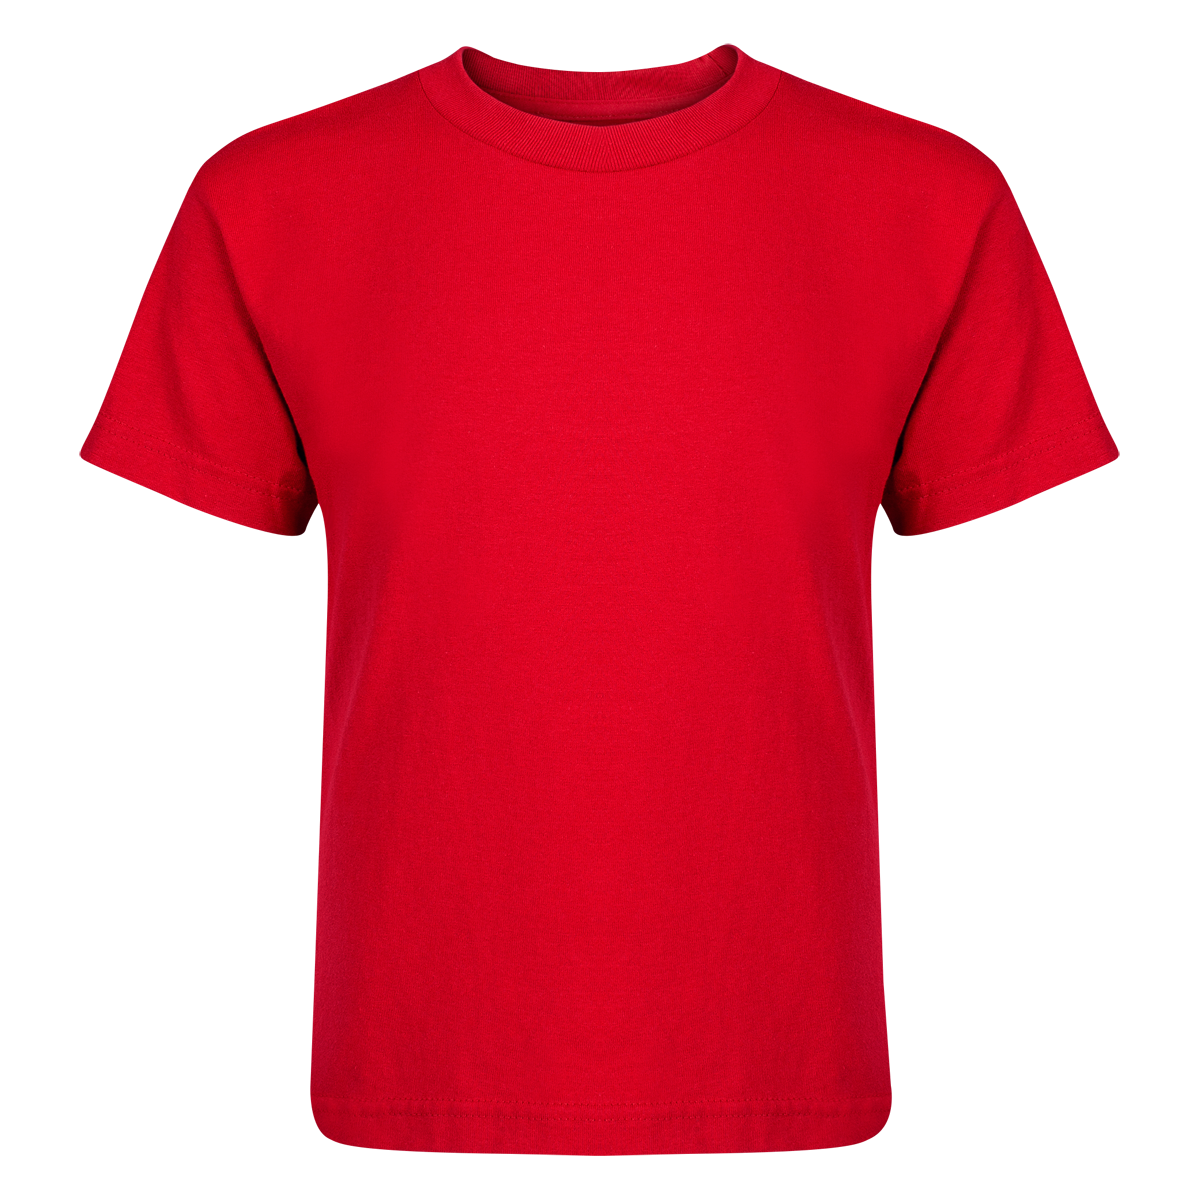 Junior Youth T Shirt Red 4 T Shirt Costumes T Shirt Design Template Shirts